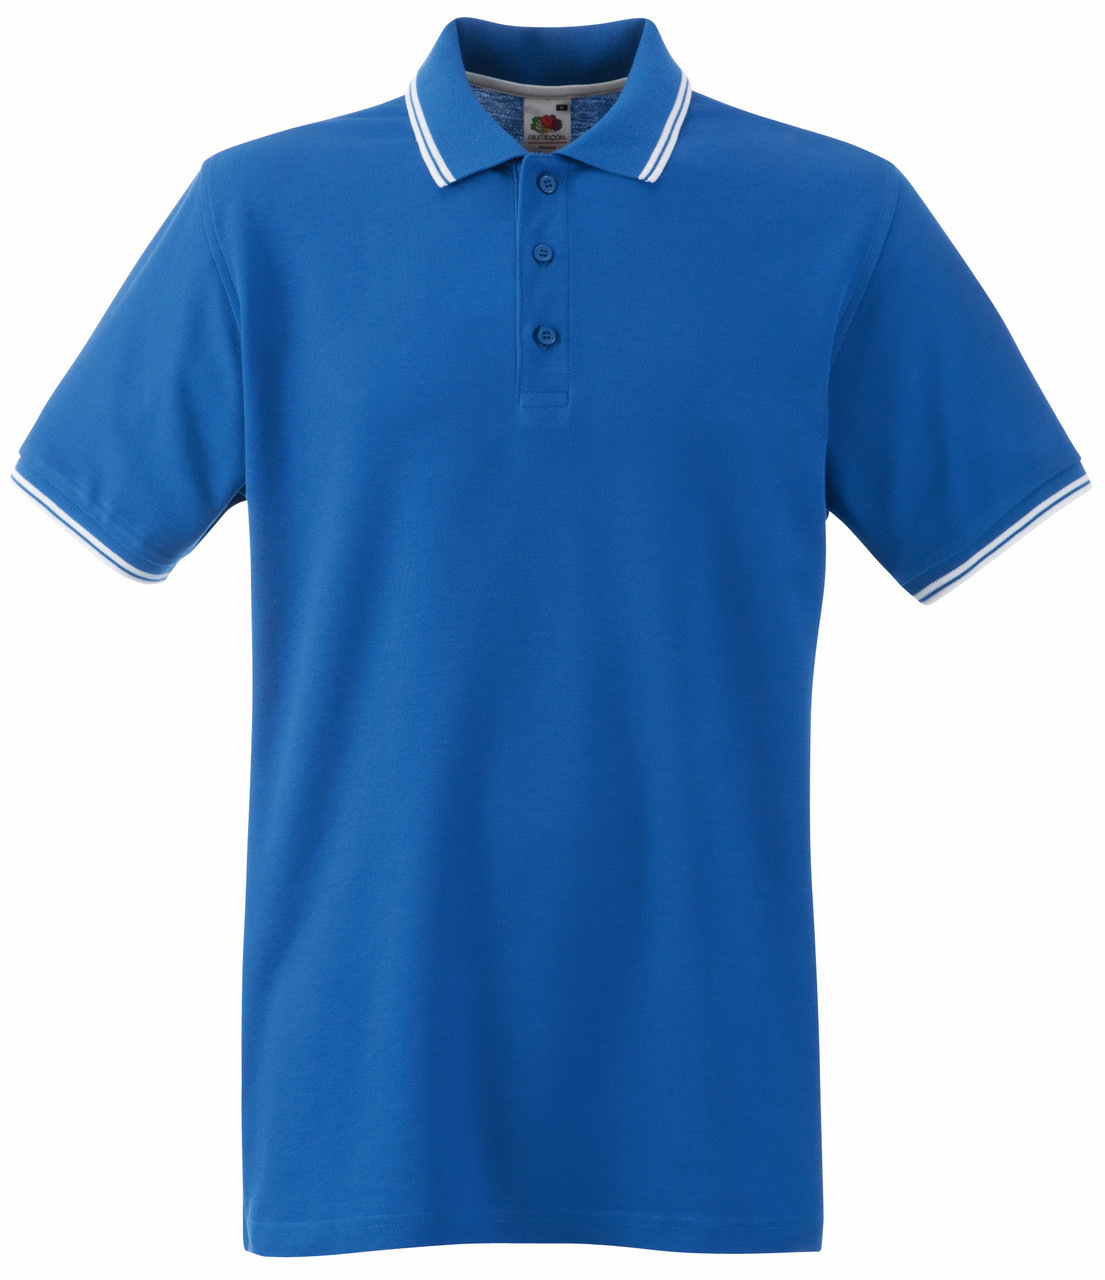 Мужское Поло Ярко-синее с Белыми Полосками Fruit of the loom 63-032-KbS